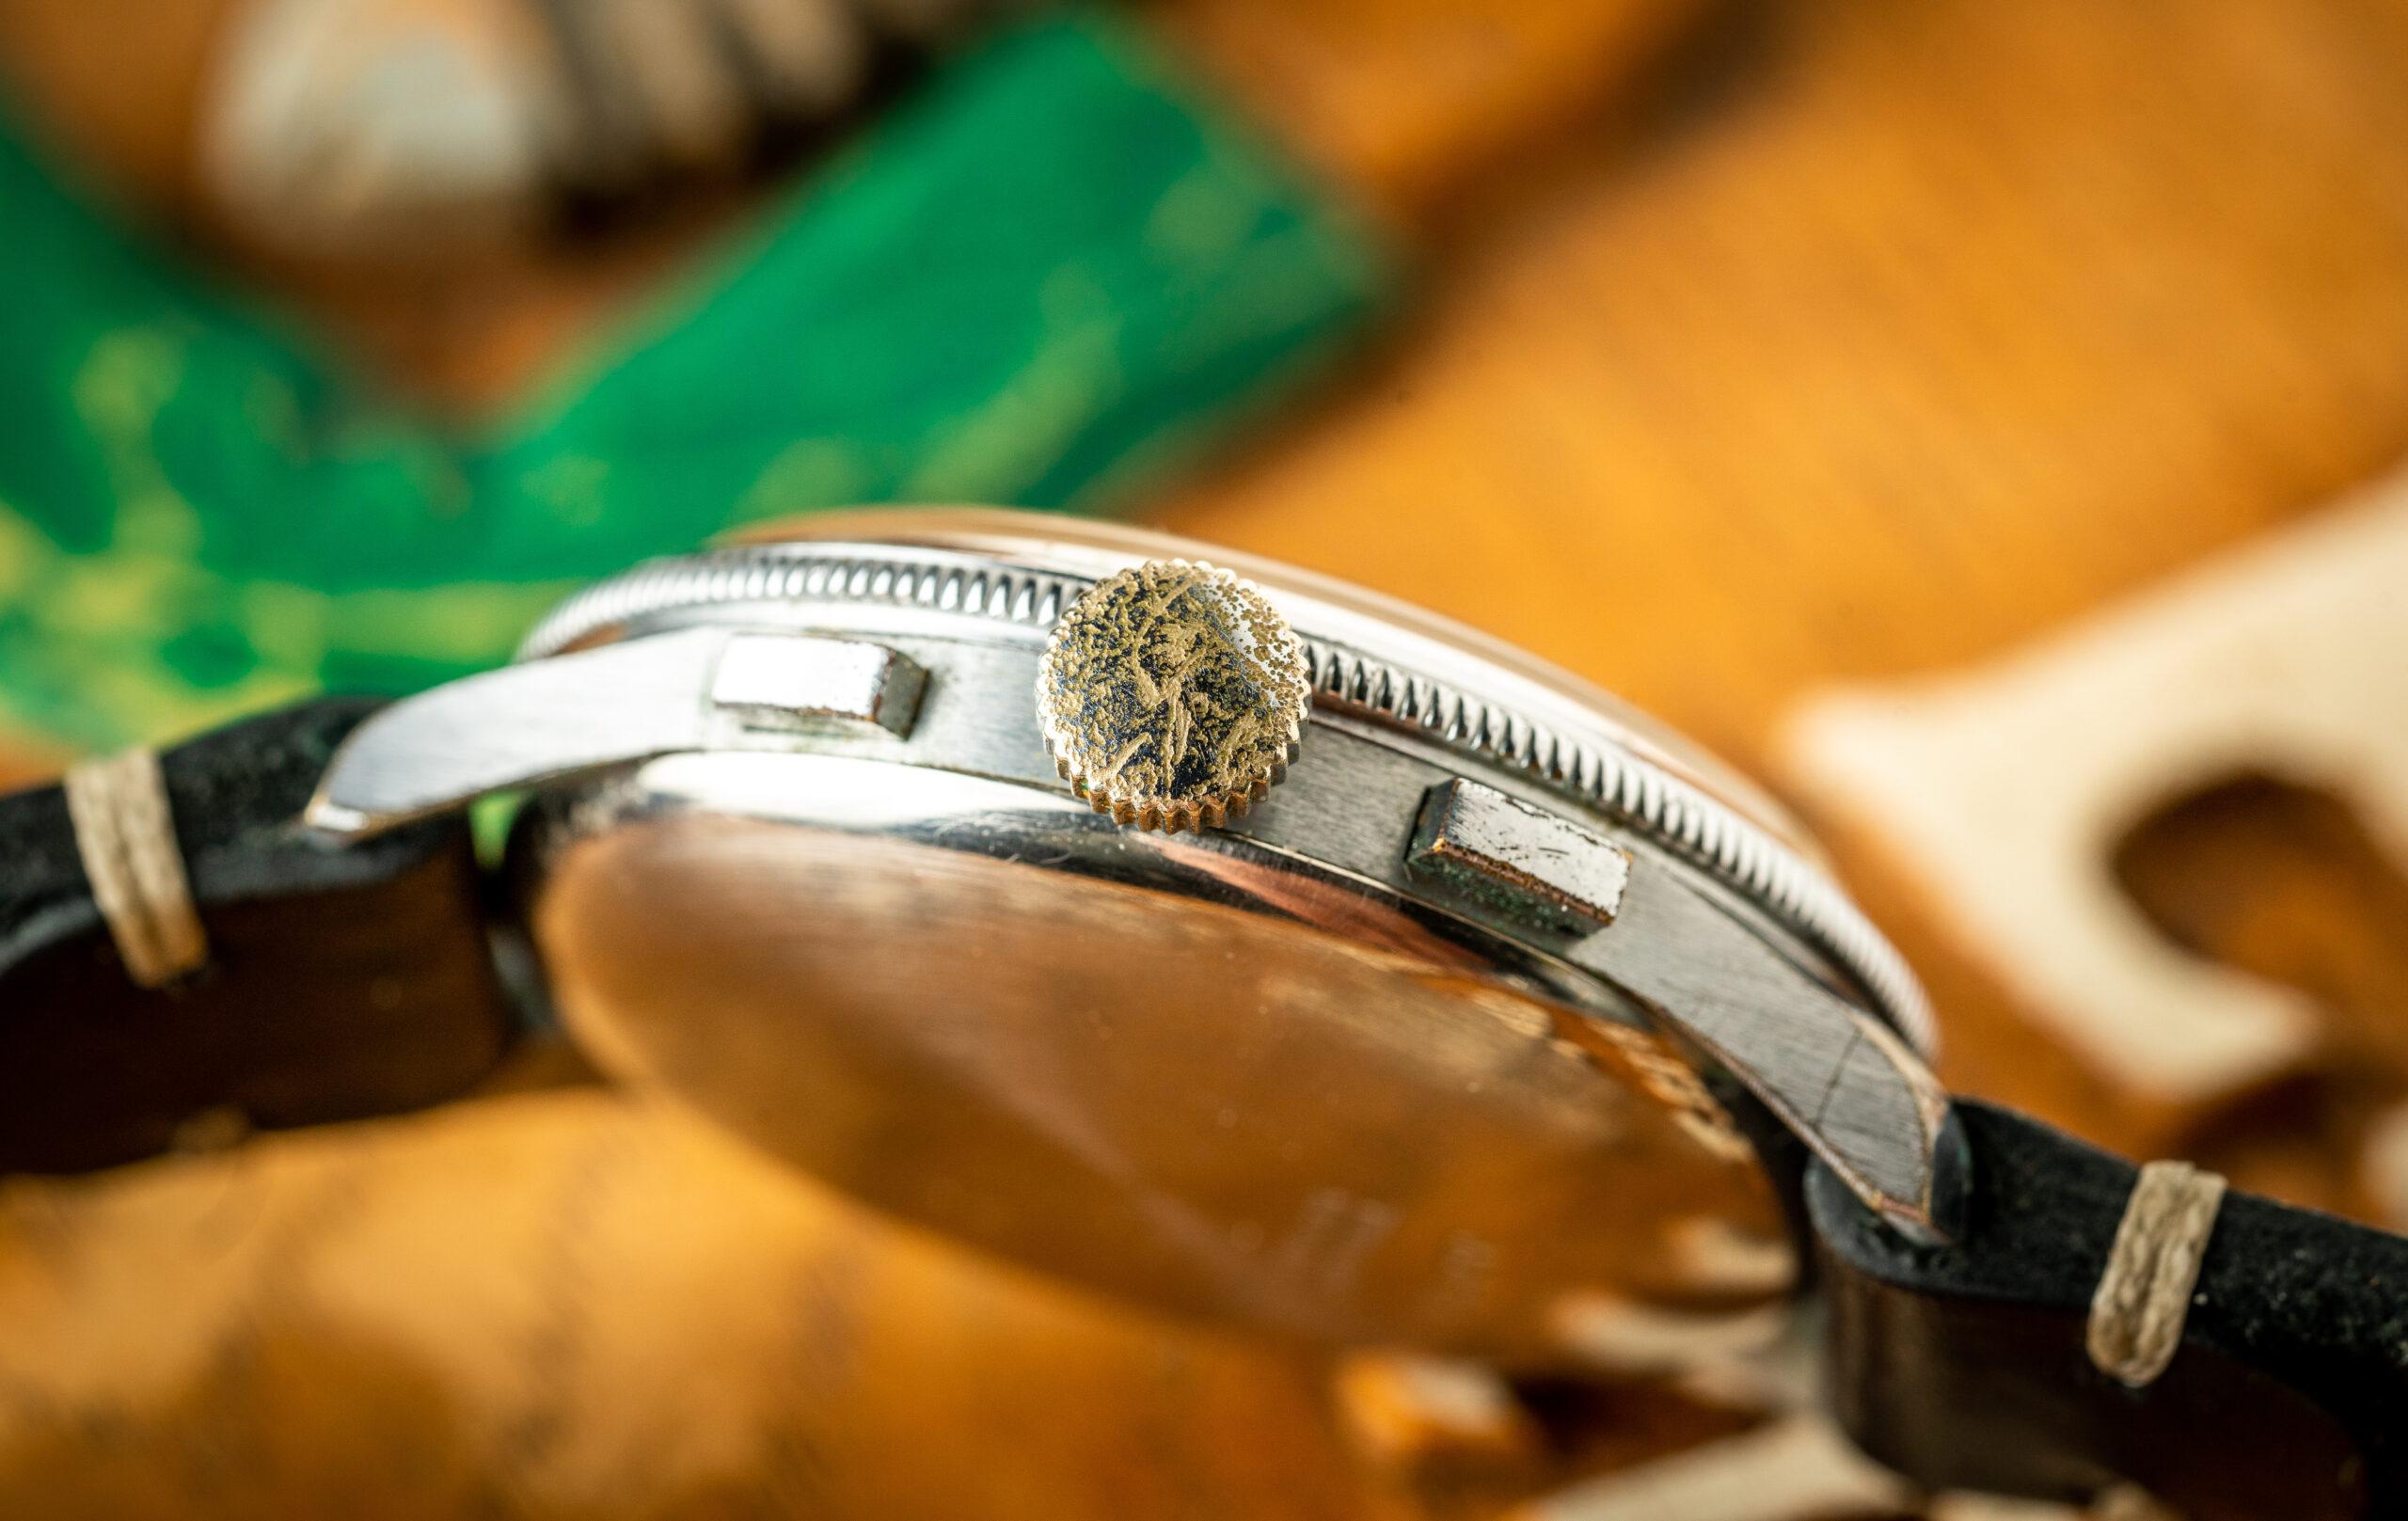 Vintage Butex Chronograph Triple Calendar watch crown